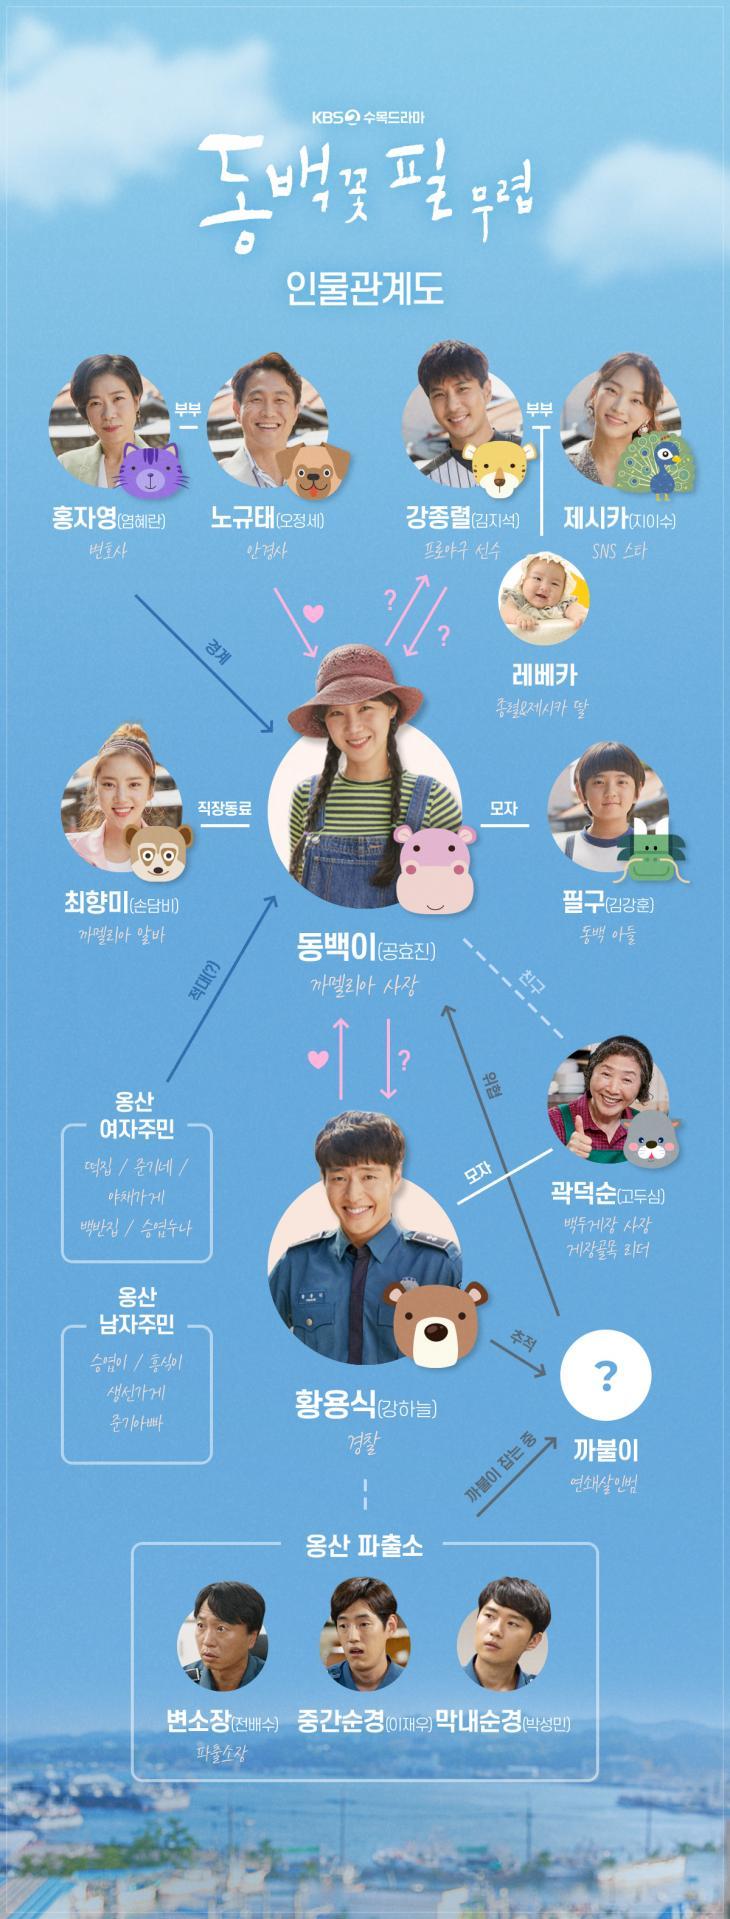 KBS2 '동백꽃 필 무렵' 홈페이지 인물관계도 사진캡처